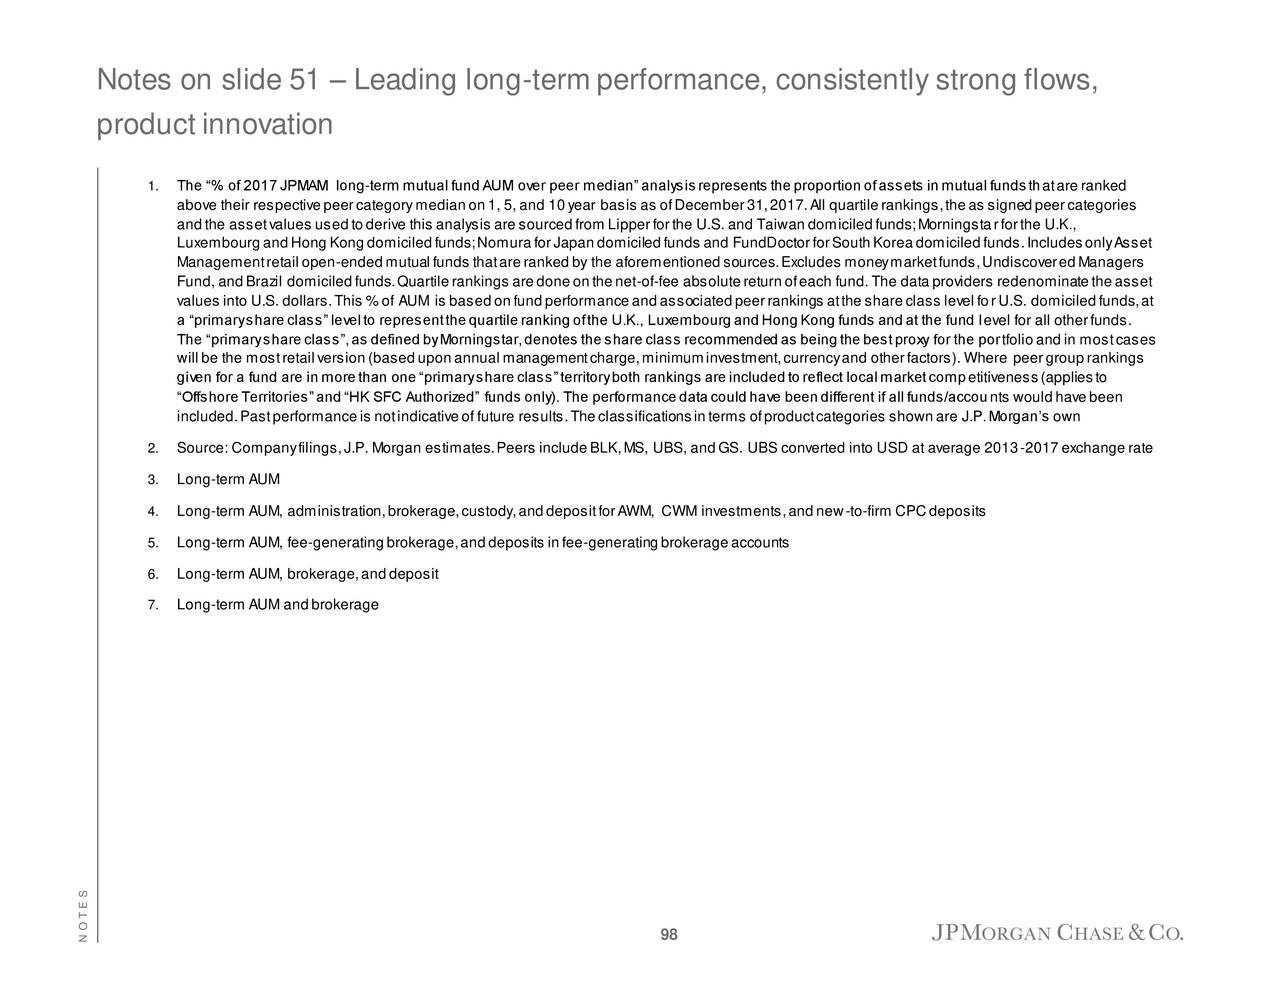 JPMorgan Chase (JPM) Investor Presentation - Slideshow - JPMorgan